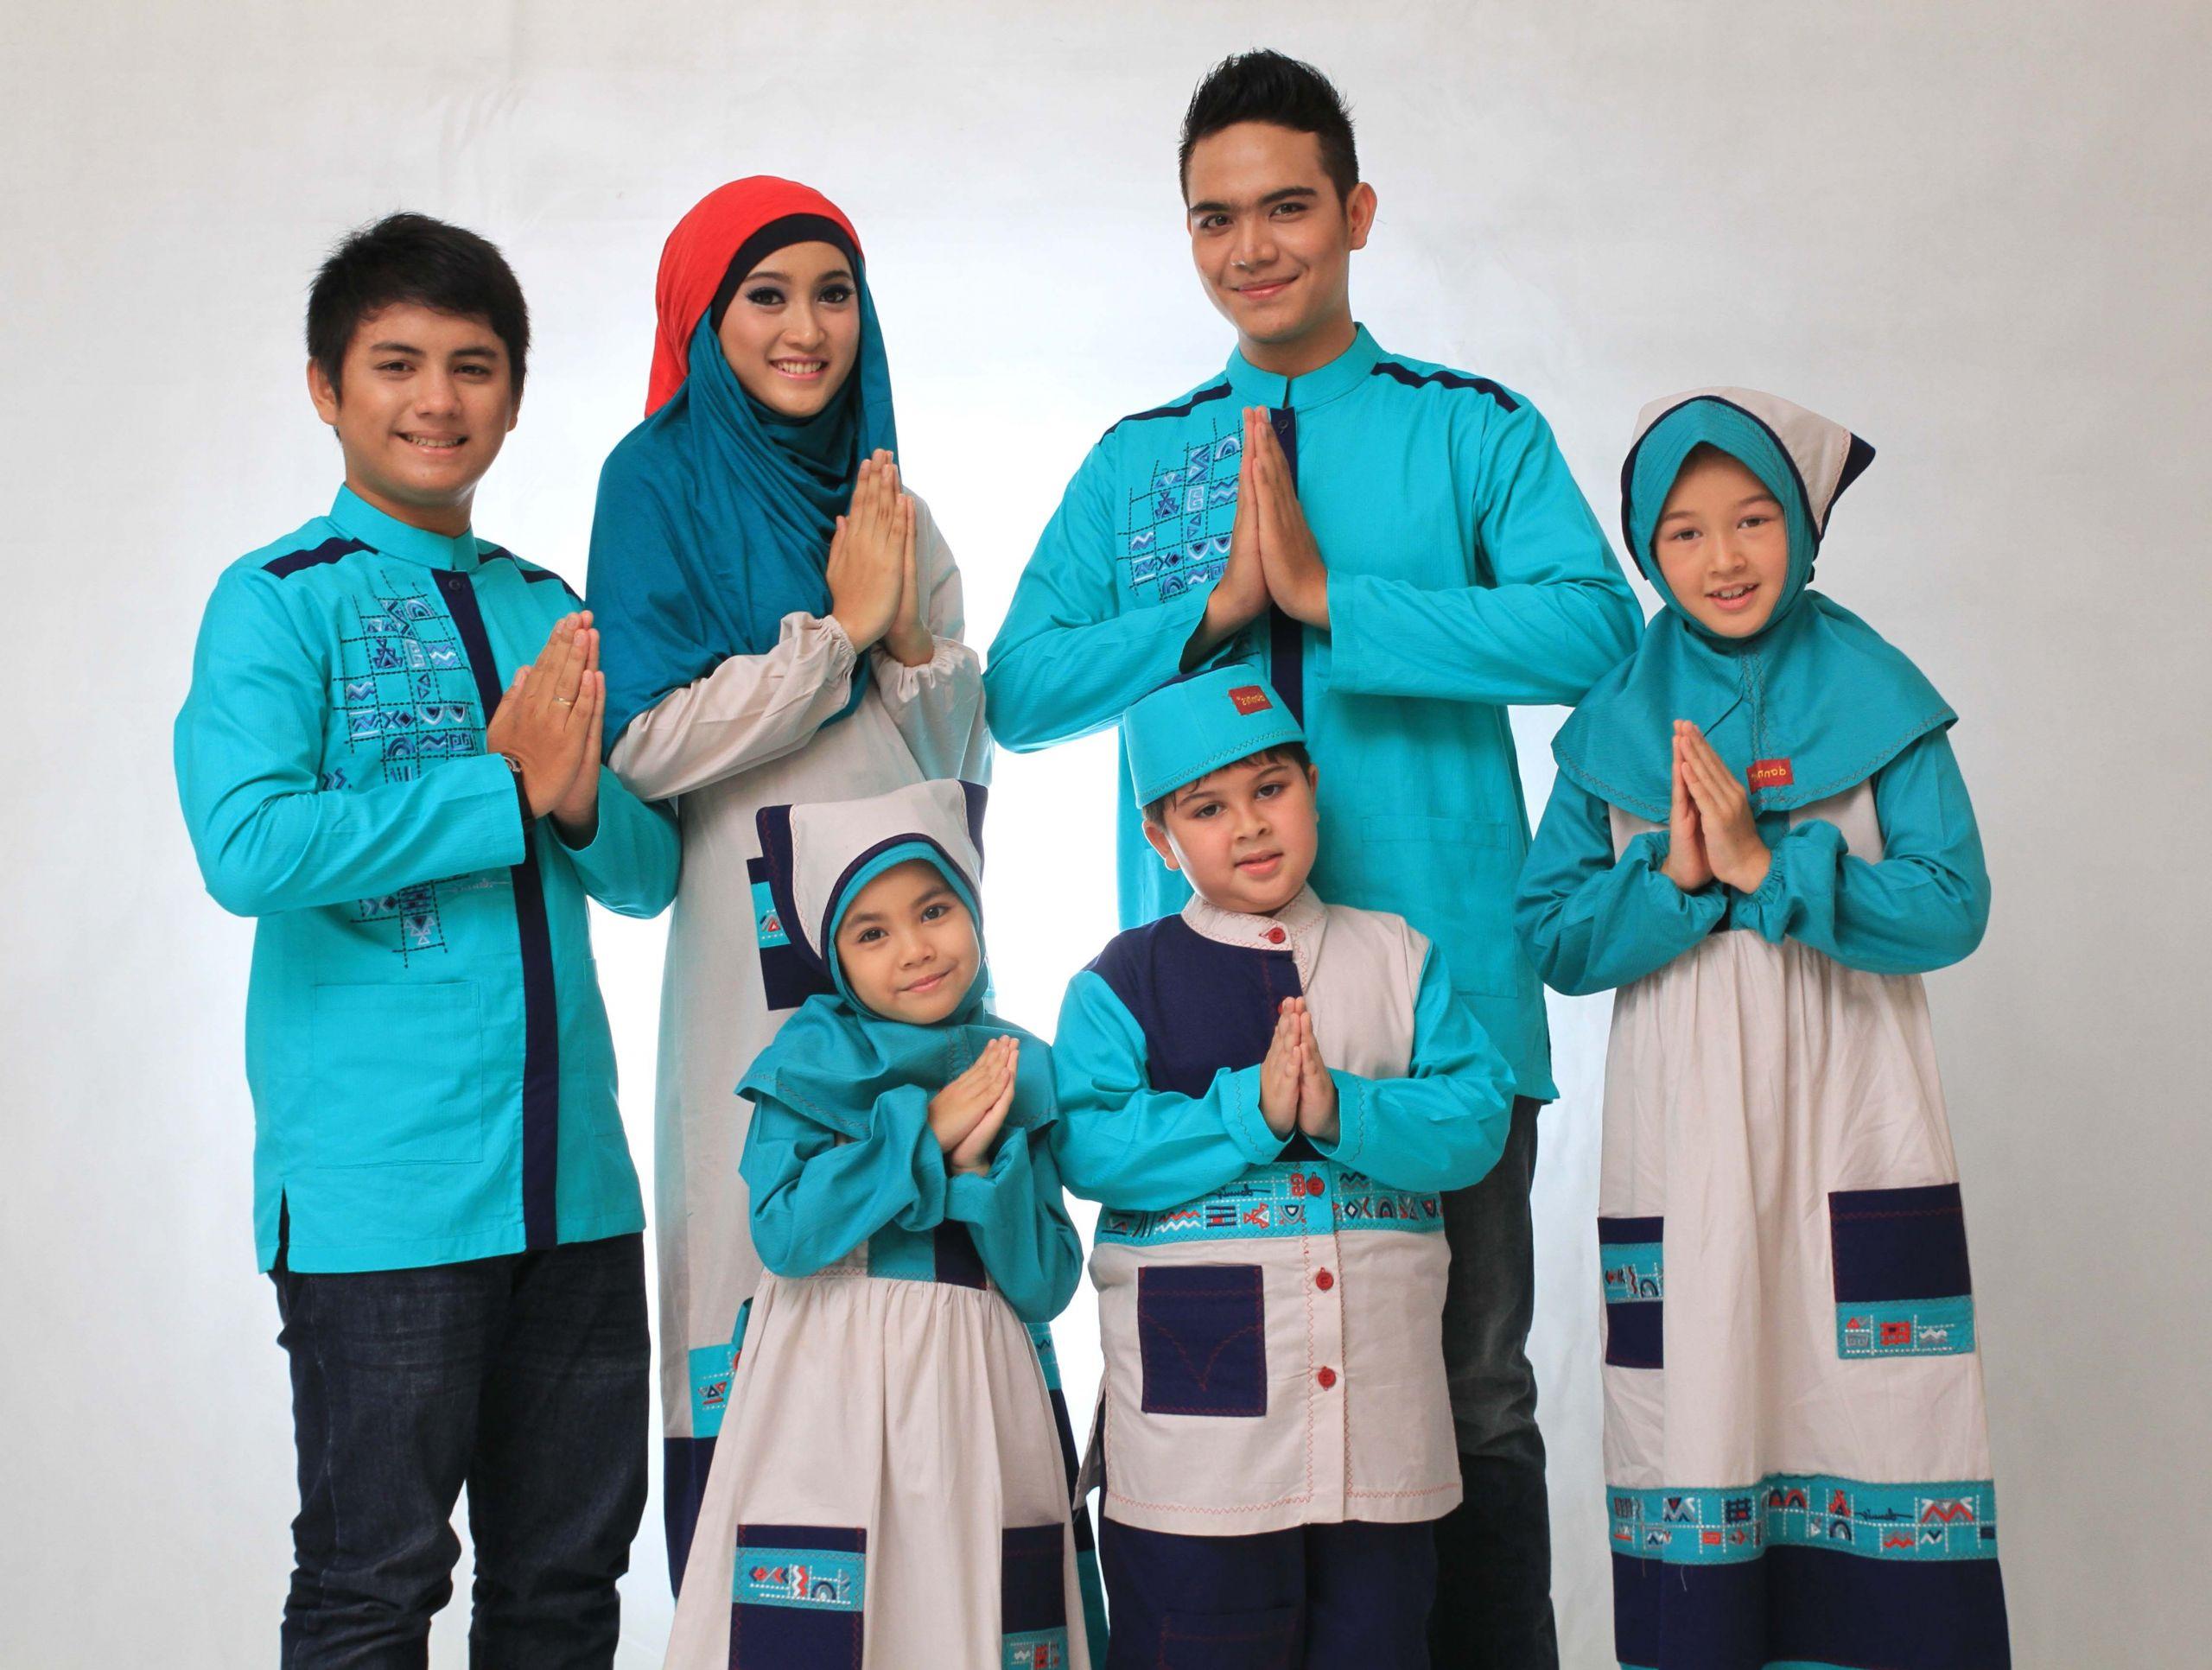 Inspirasi Model Baju Lebaran Keluarga 2019 Rldj Baju Muslim Untuk Lebaran Berhijab